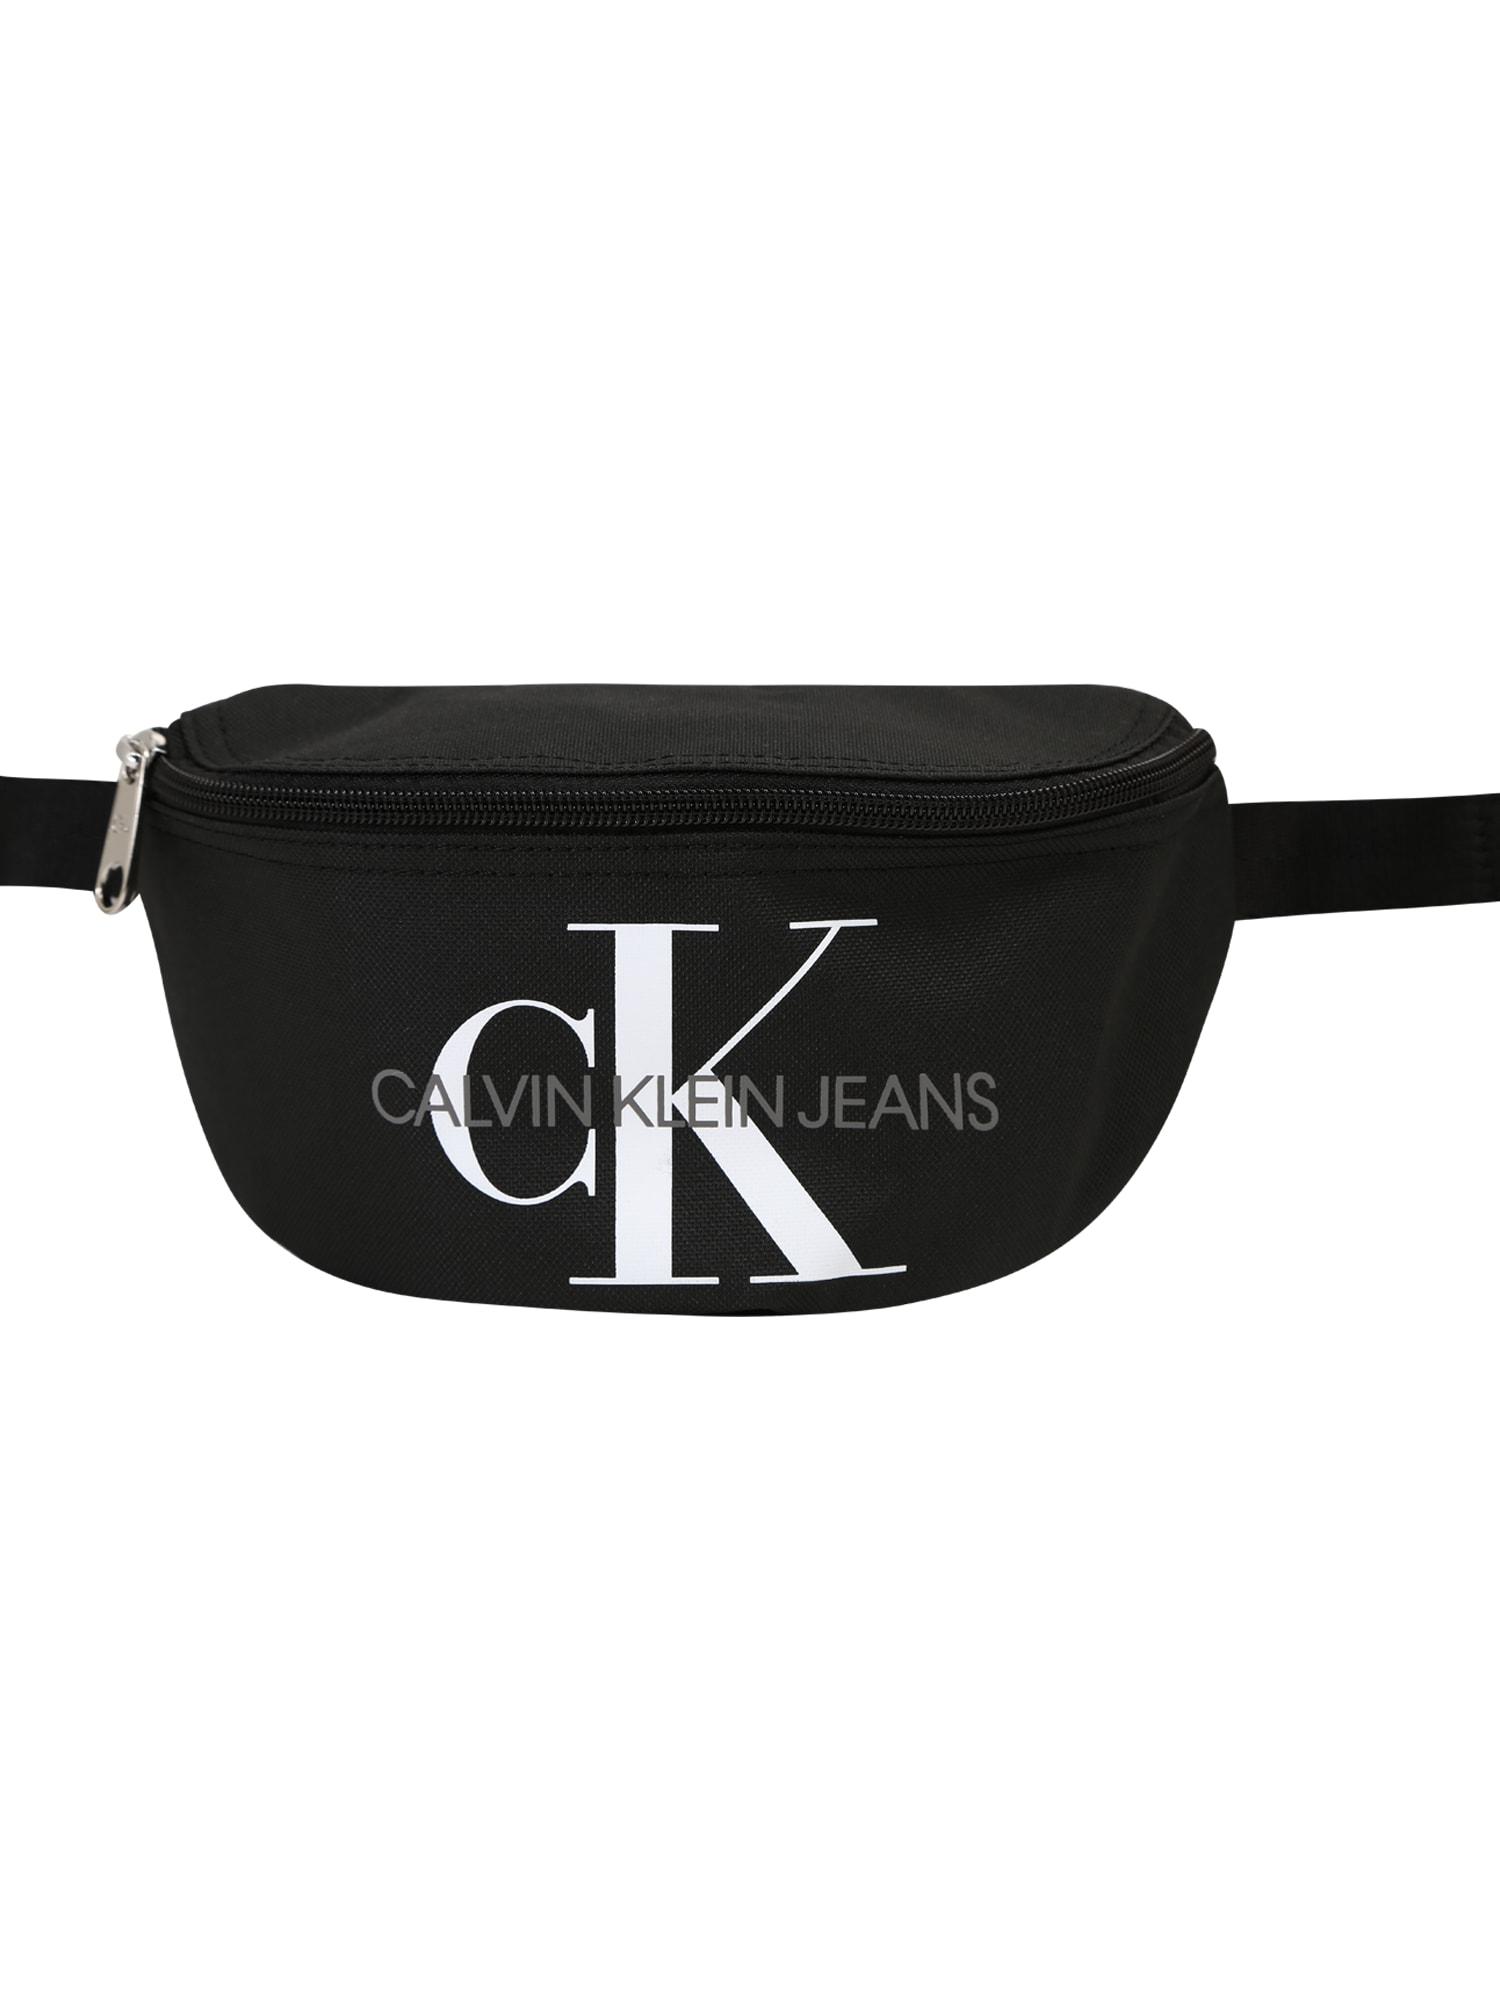 Calvin Klein Jeans Kabelky 'MONOGRAM WAIST PACK' čierna